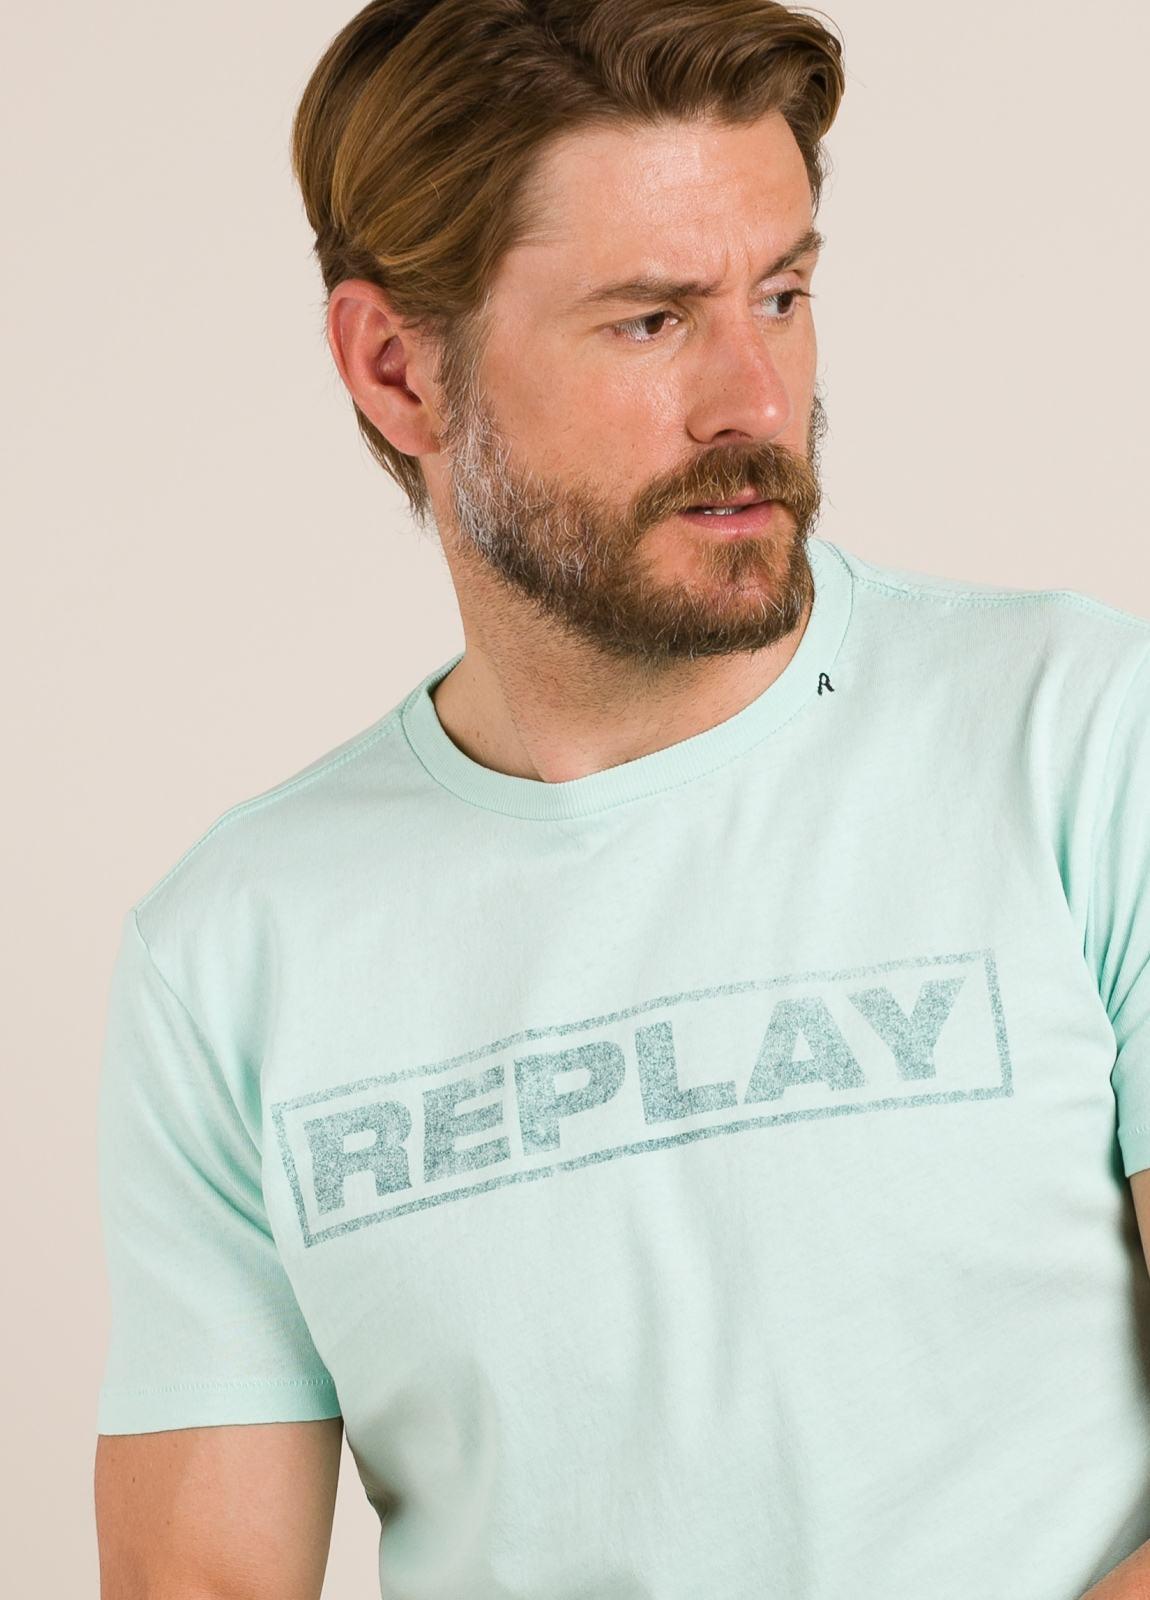 Camiseta REPLAY estampado gráfico verde - Ítem2